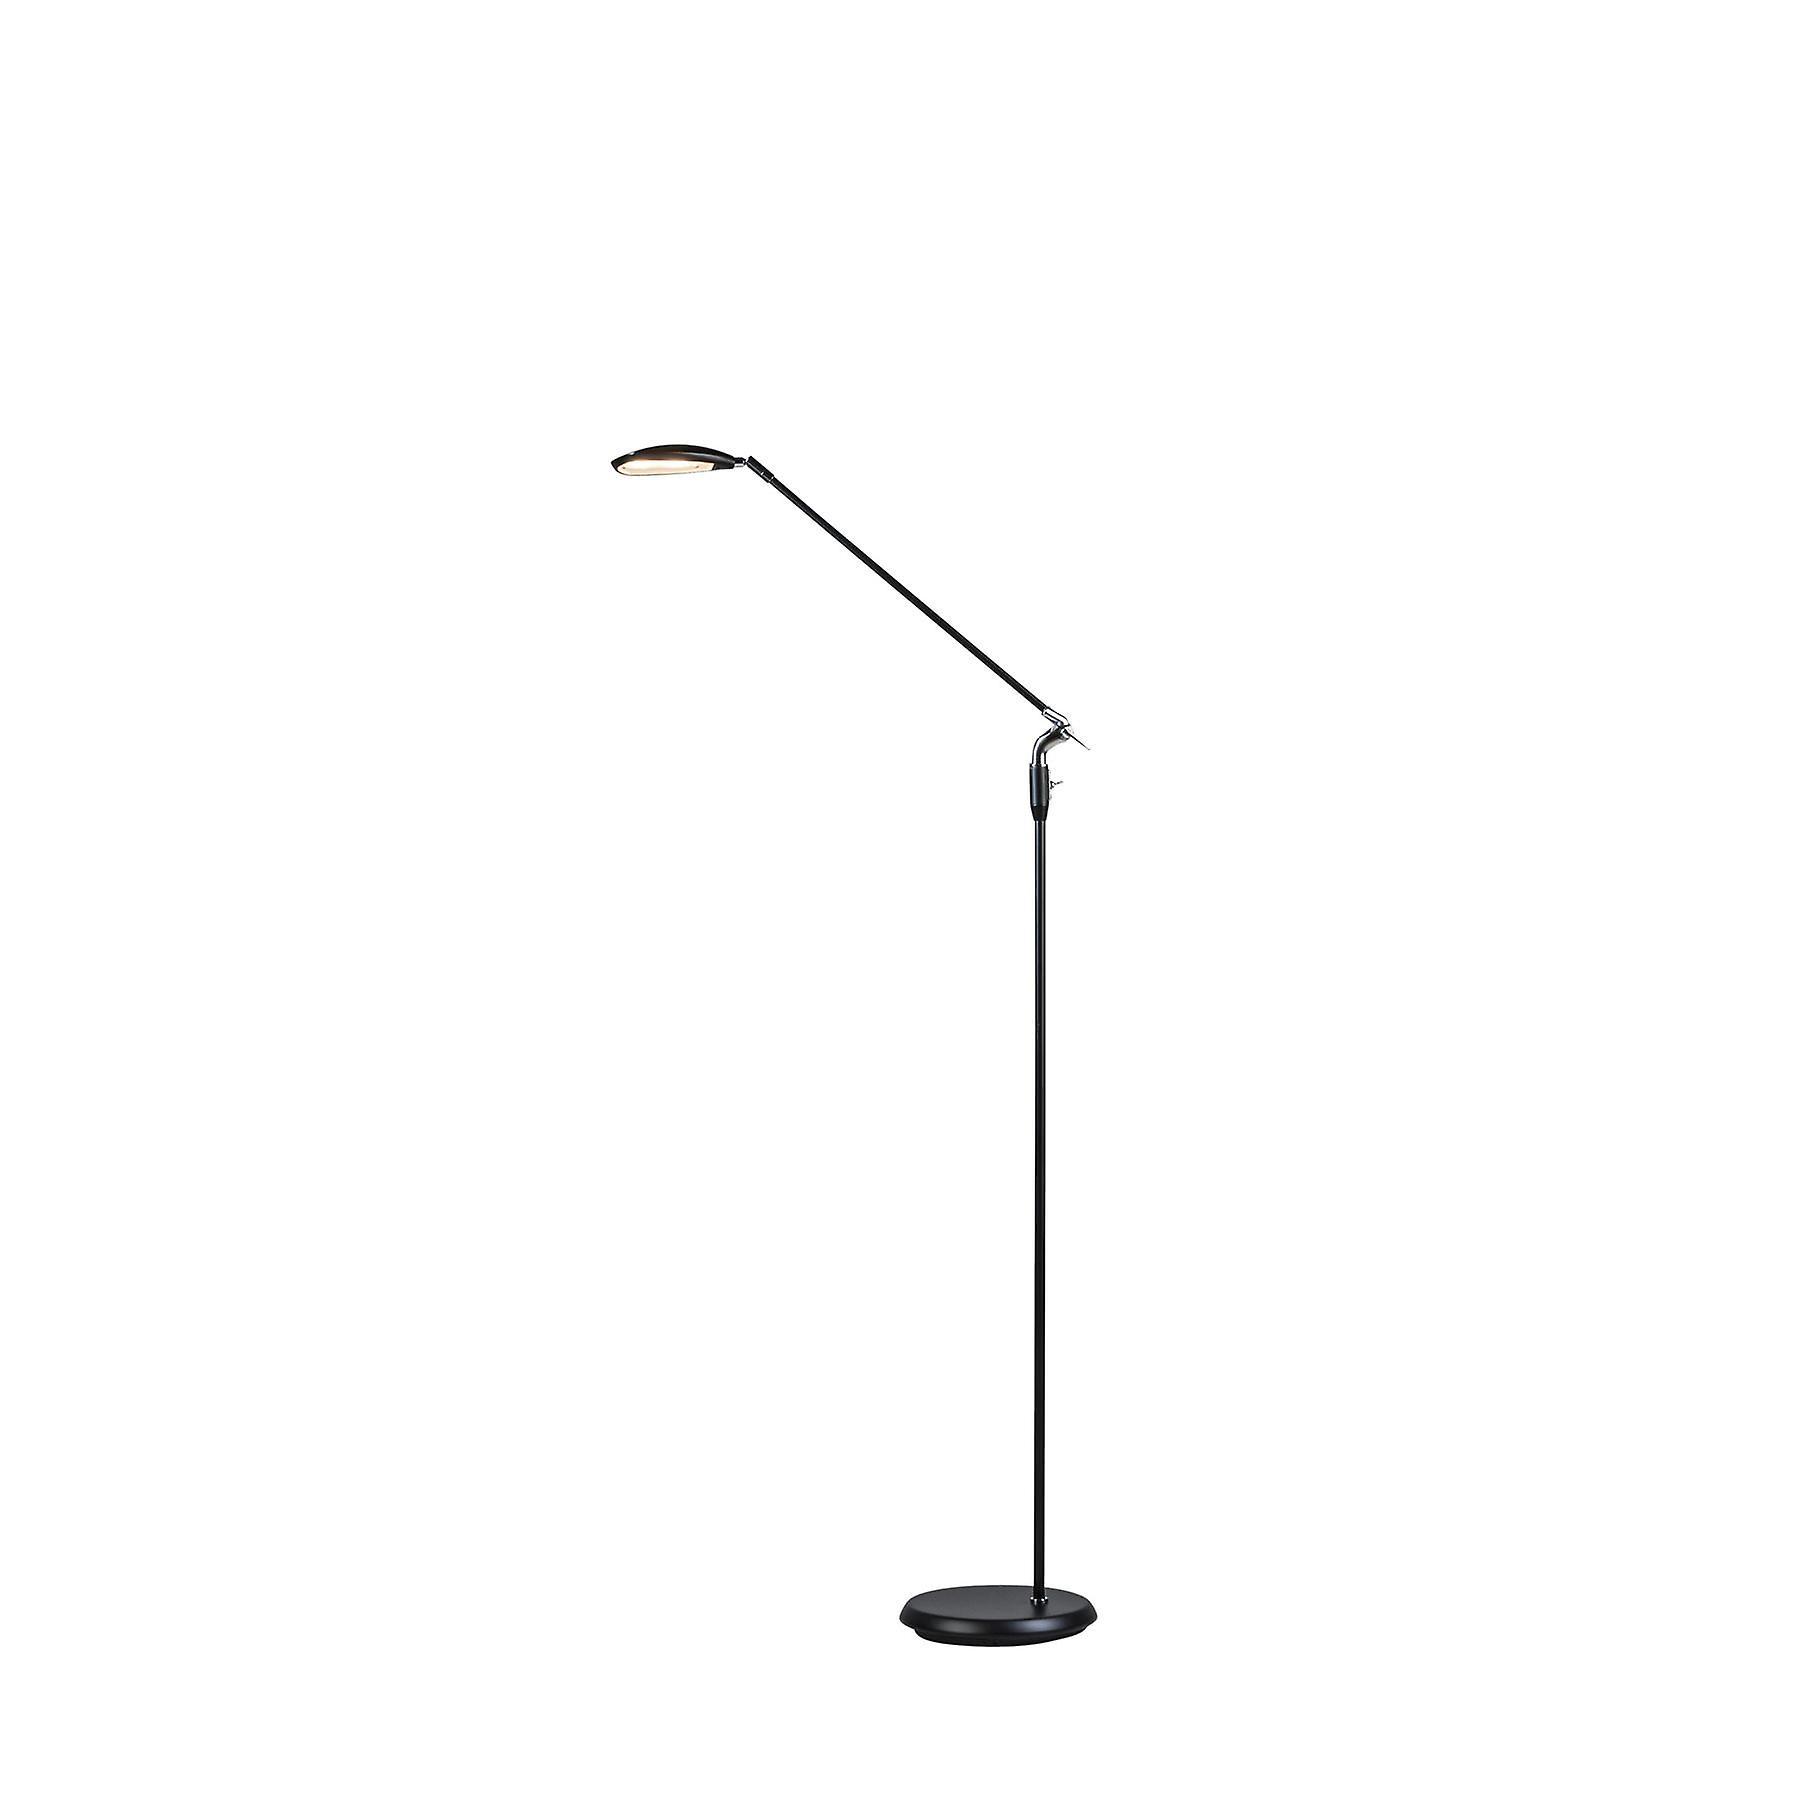 Belid - spectres lampadaire en noir mat 305407